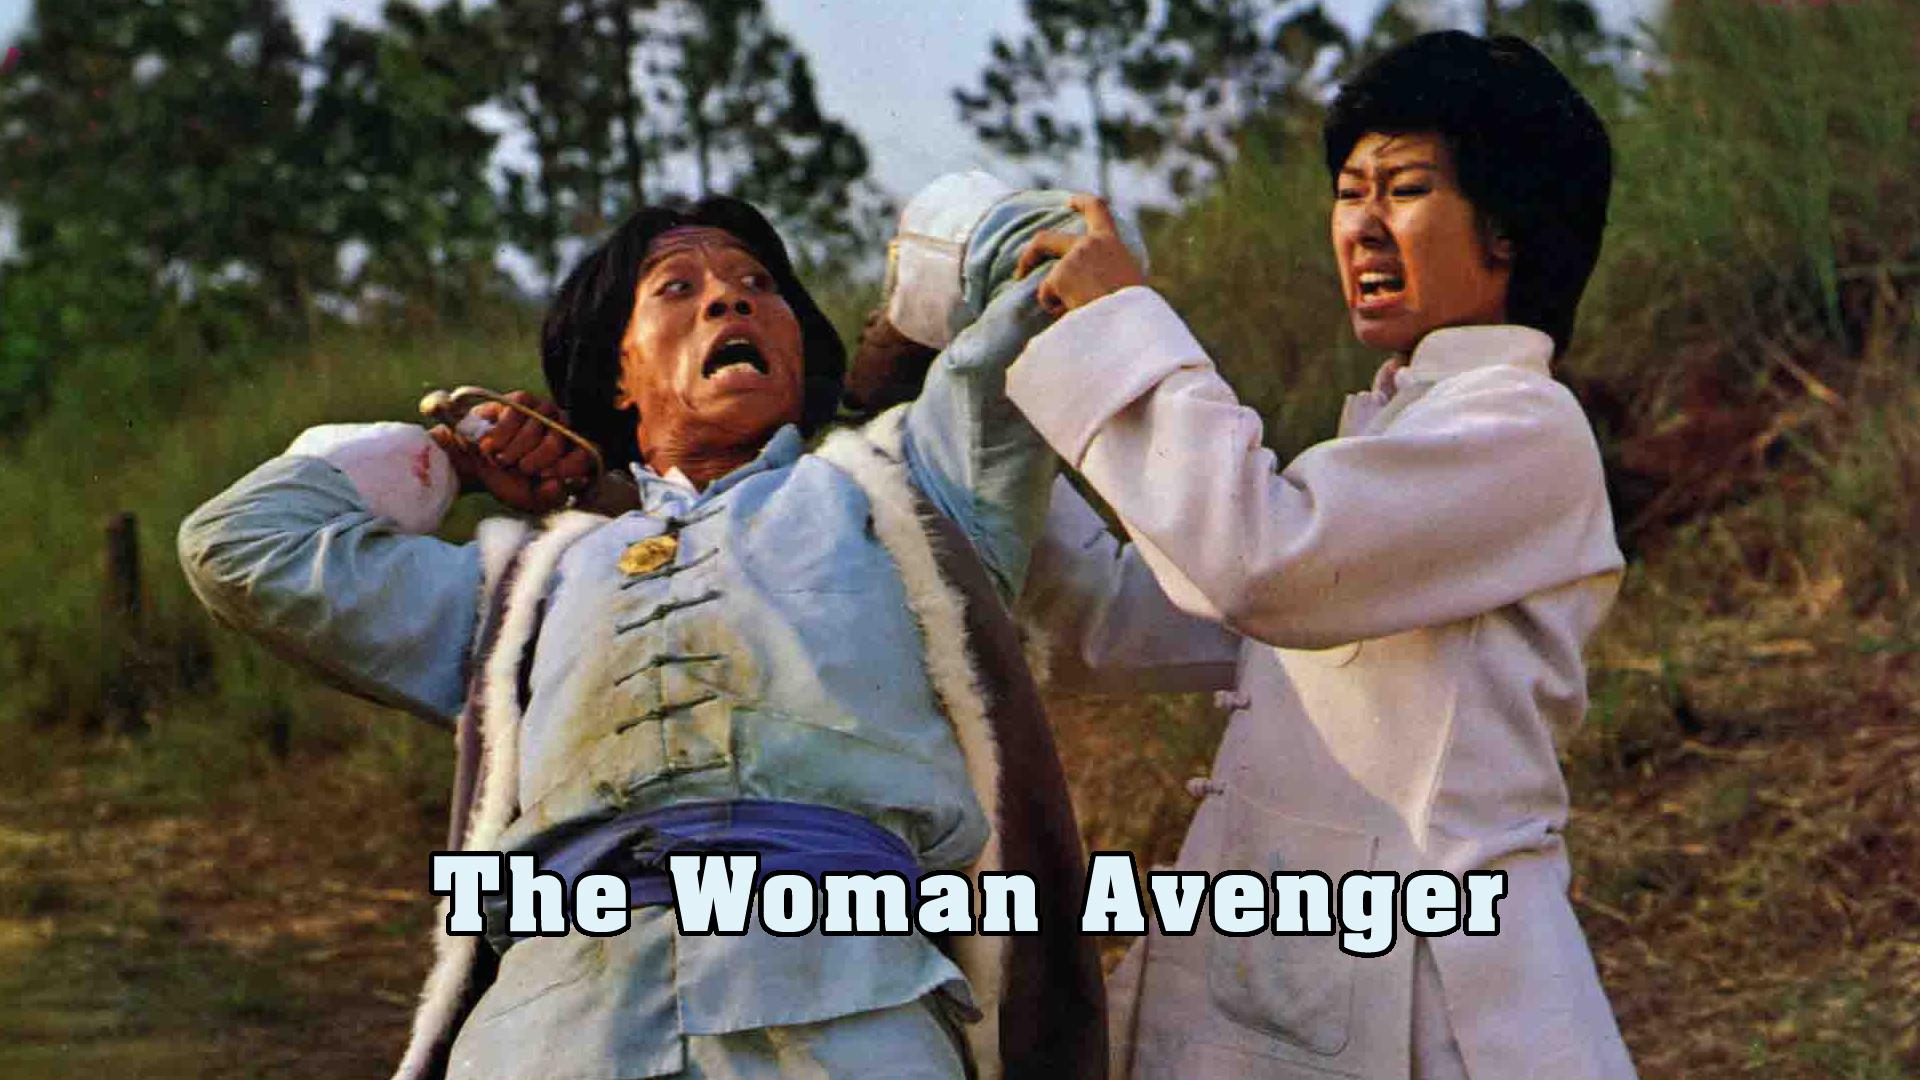 The Woman Avenger